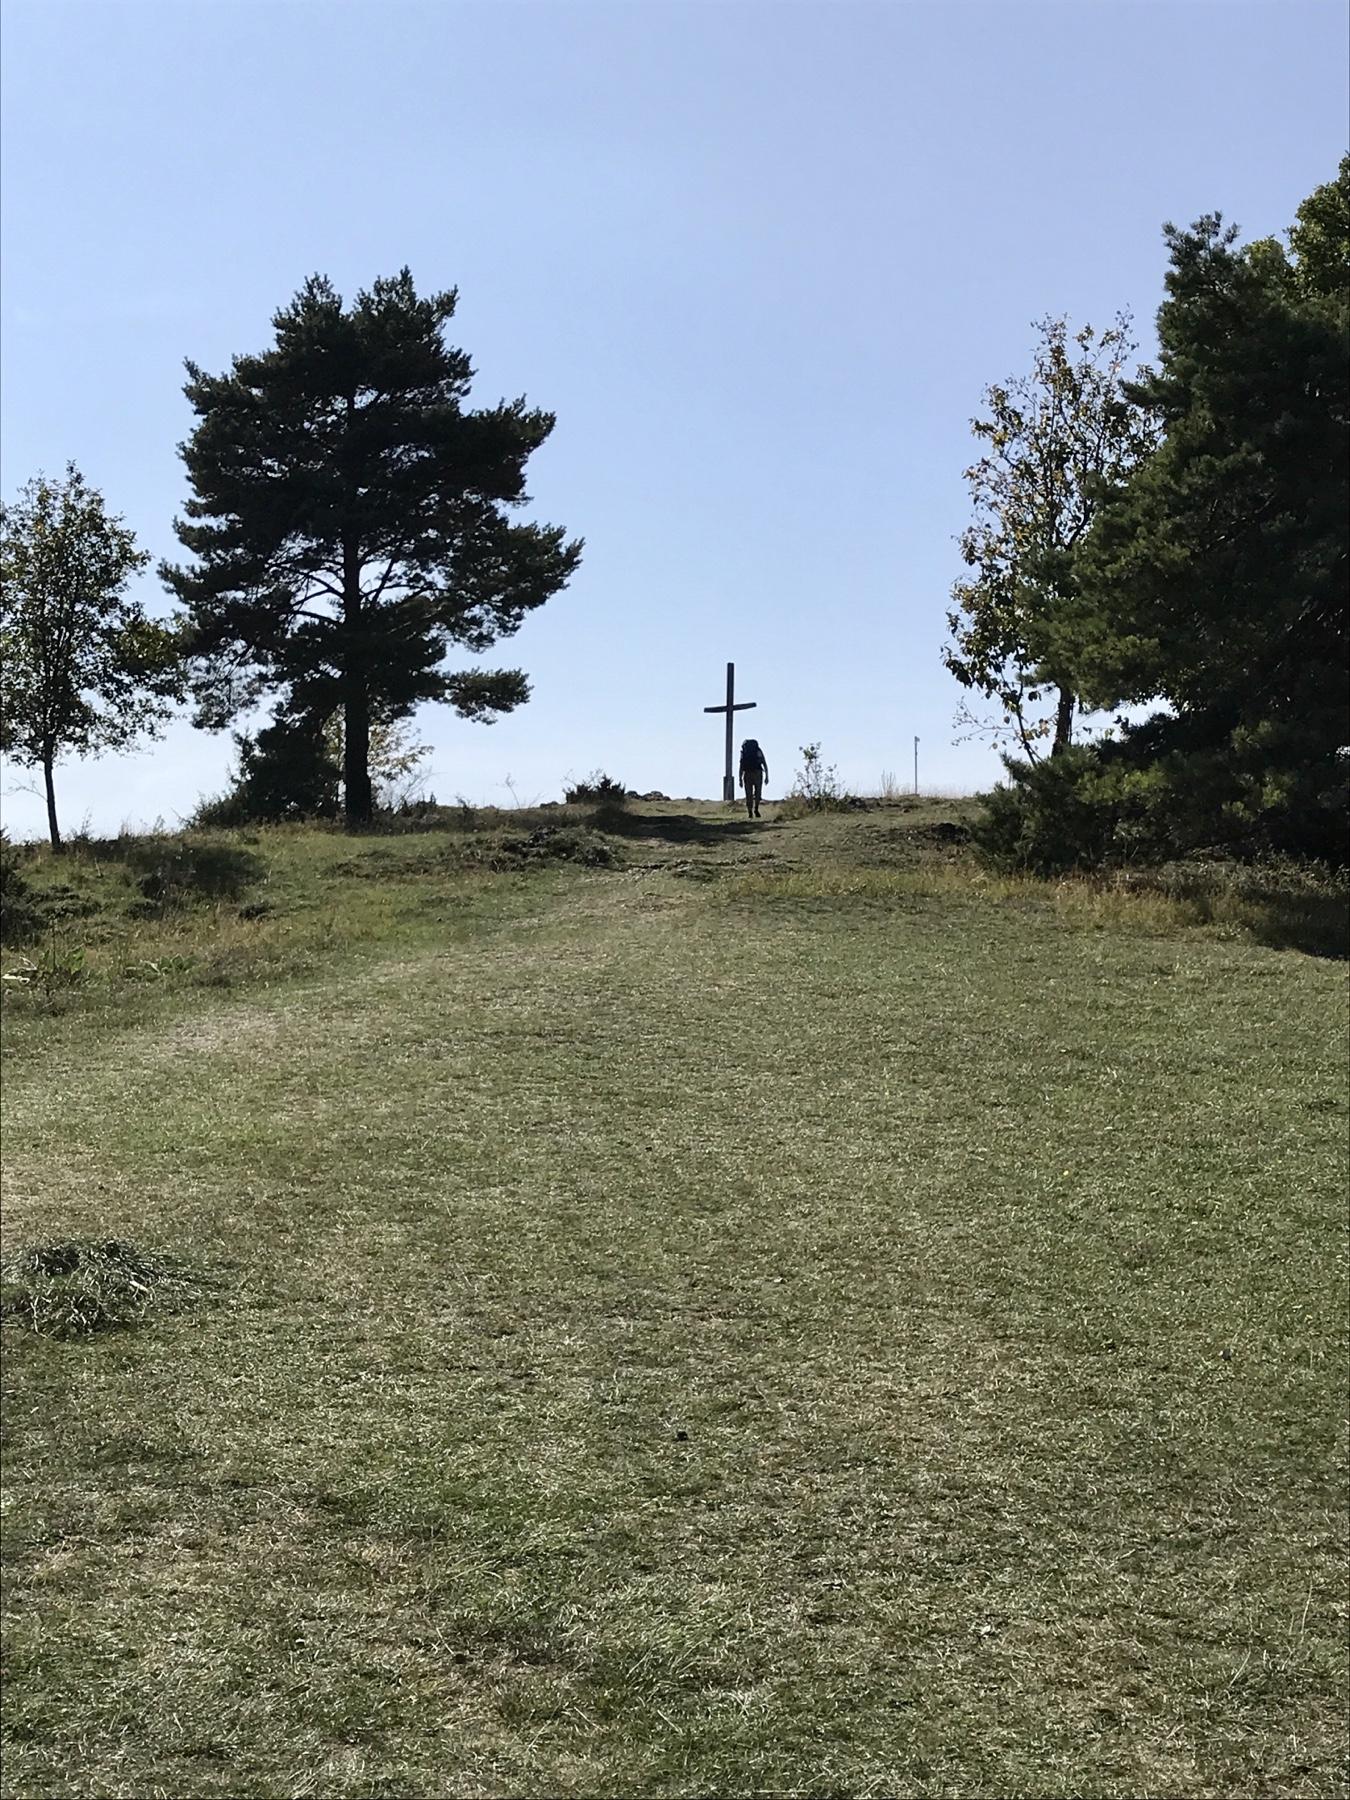 Gipfelkreuz am Bockberg, Albsteig Etappe Harburg Mönchsdeggingen